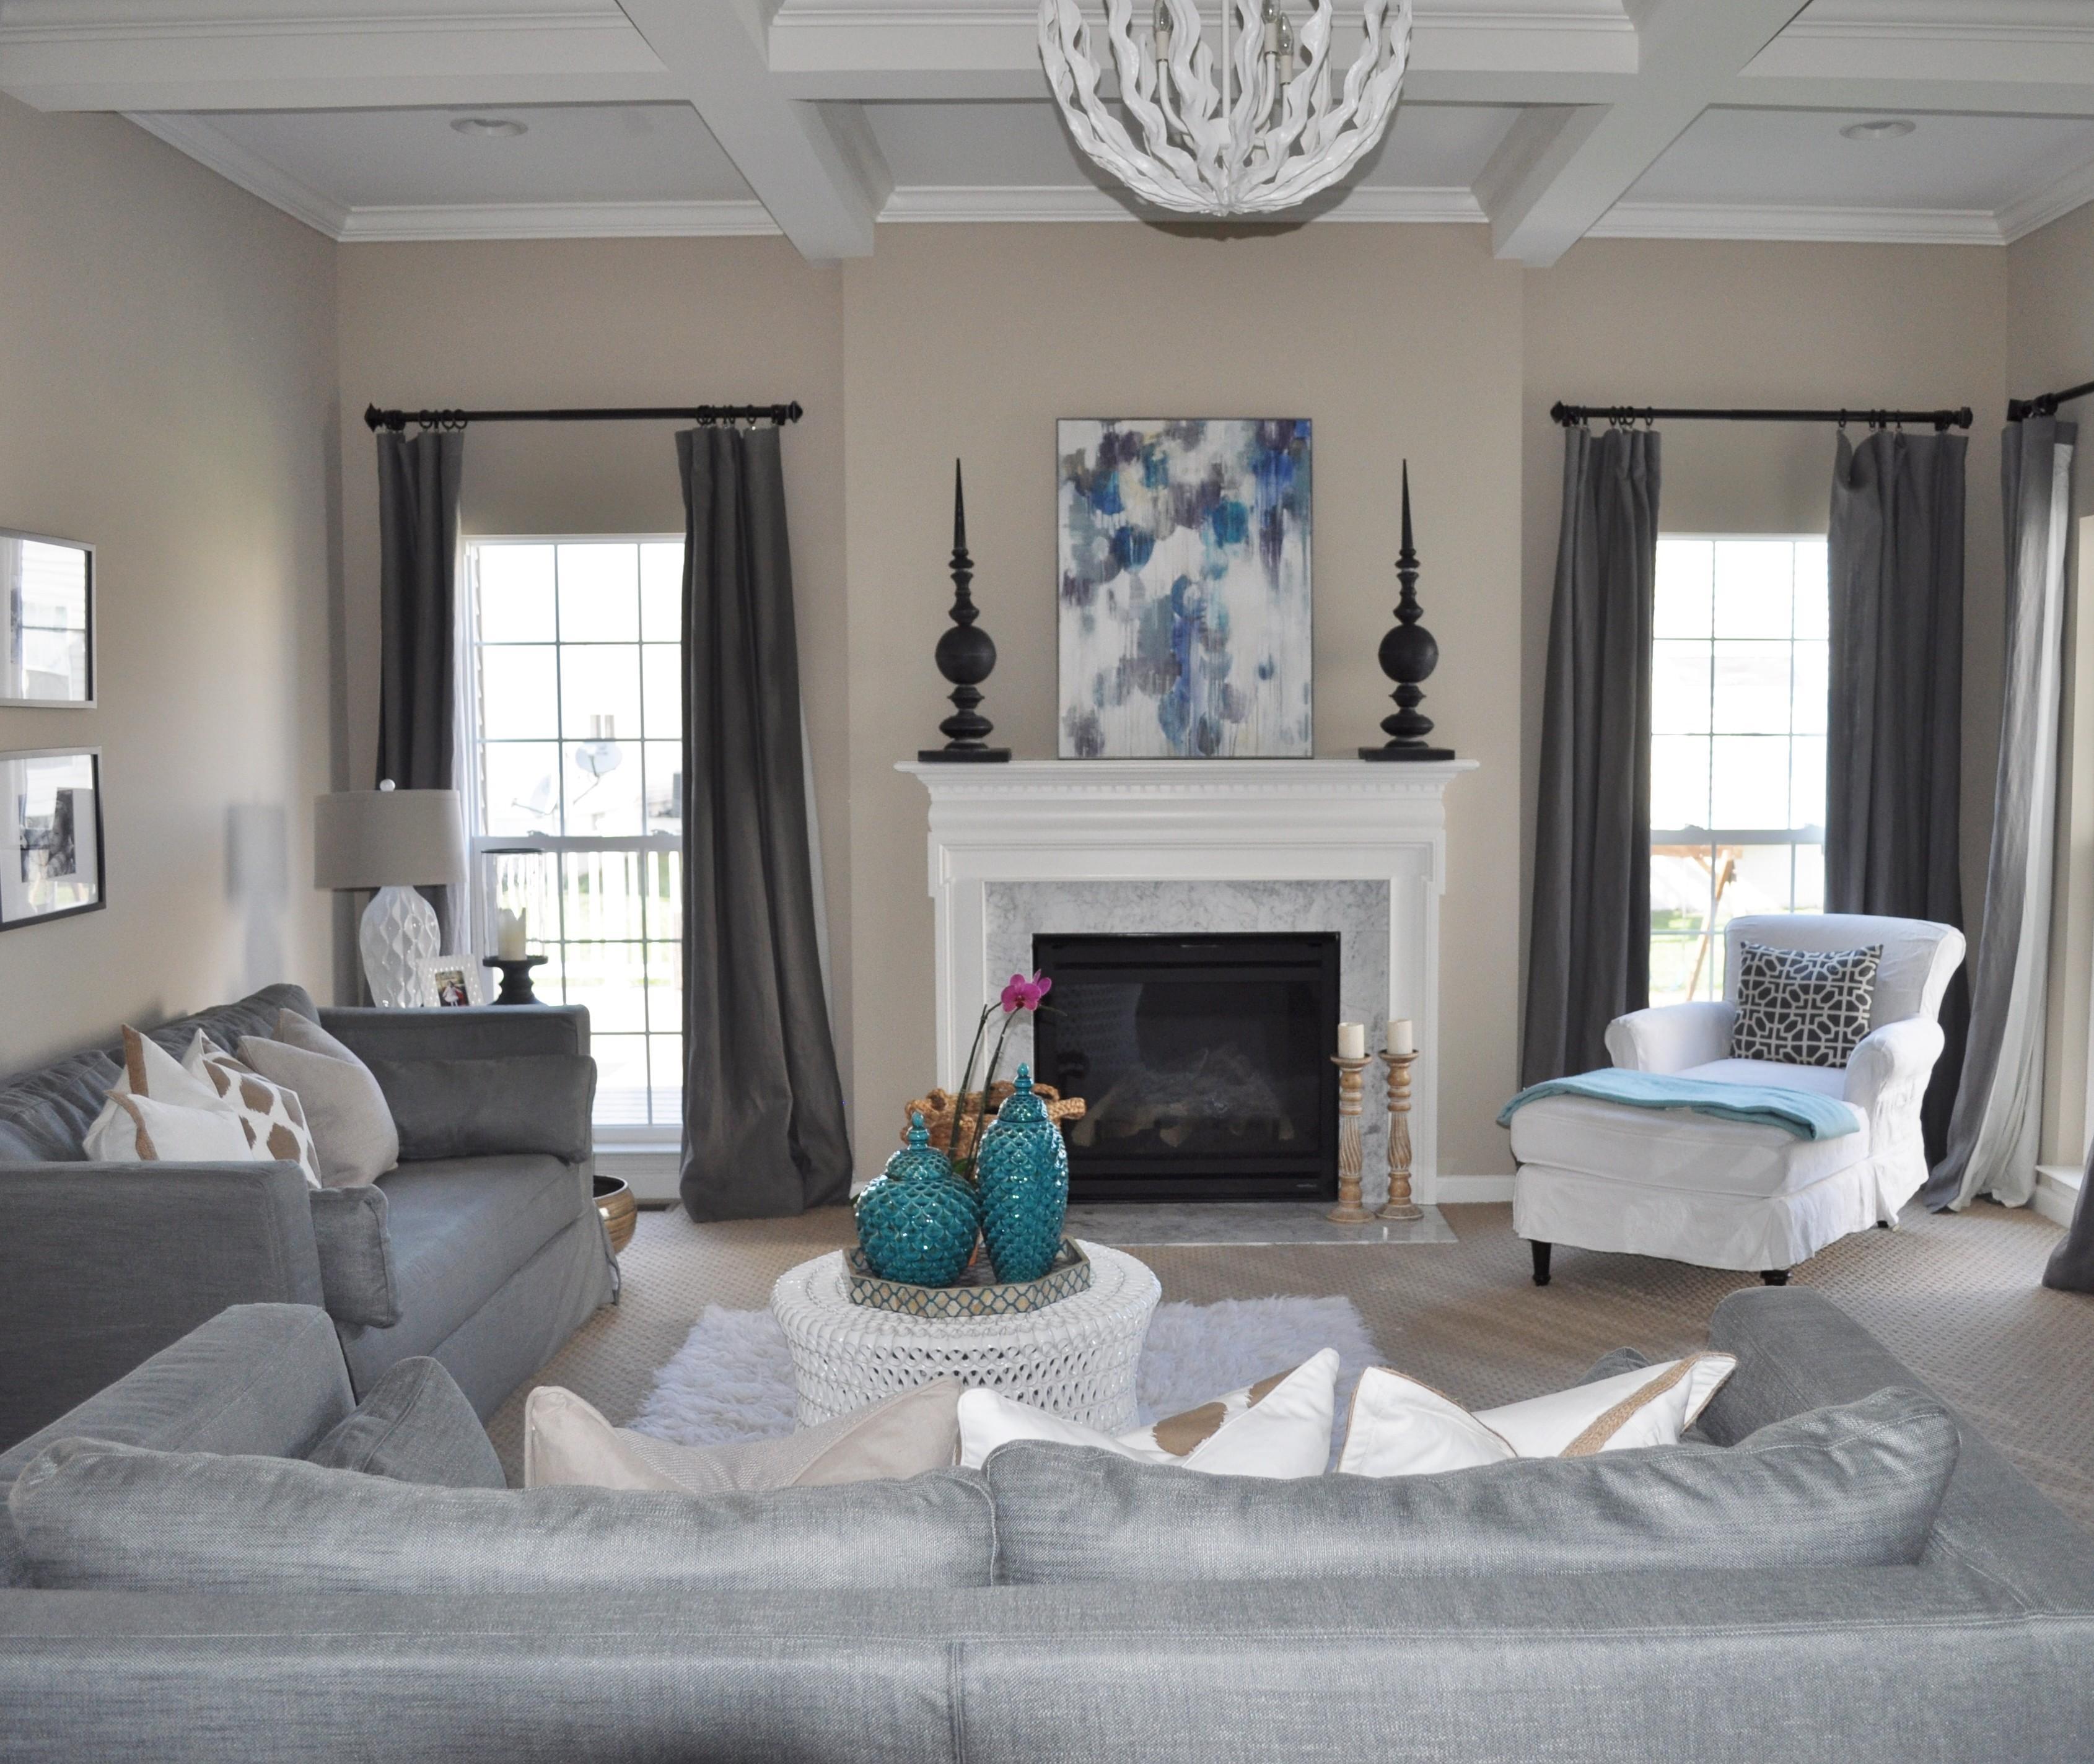 Gray Turquoise Living Room Decorating Ideas Decoratorist 13210